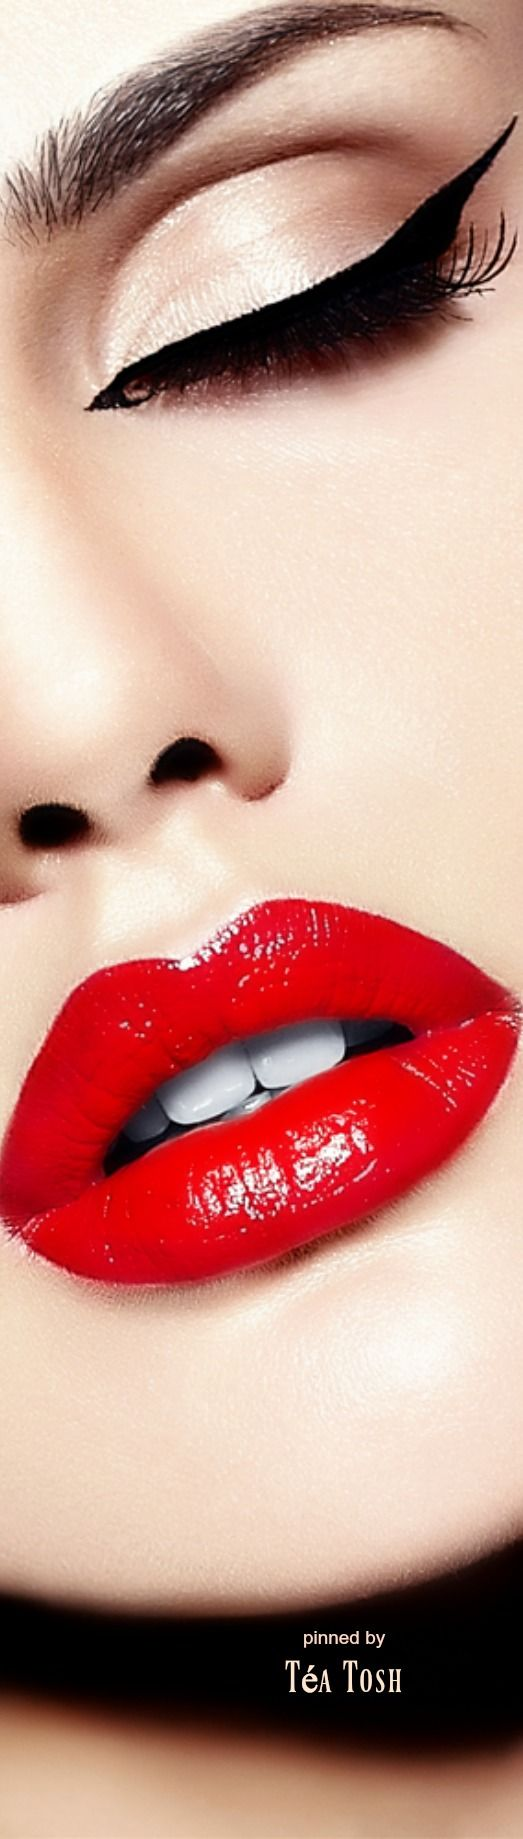 ❇︎Téa Tosh❇︎Perfect Red Lips ;)                              …